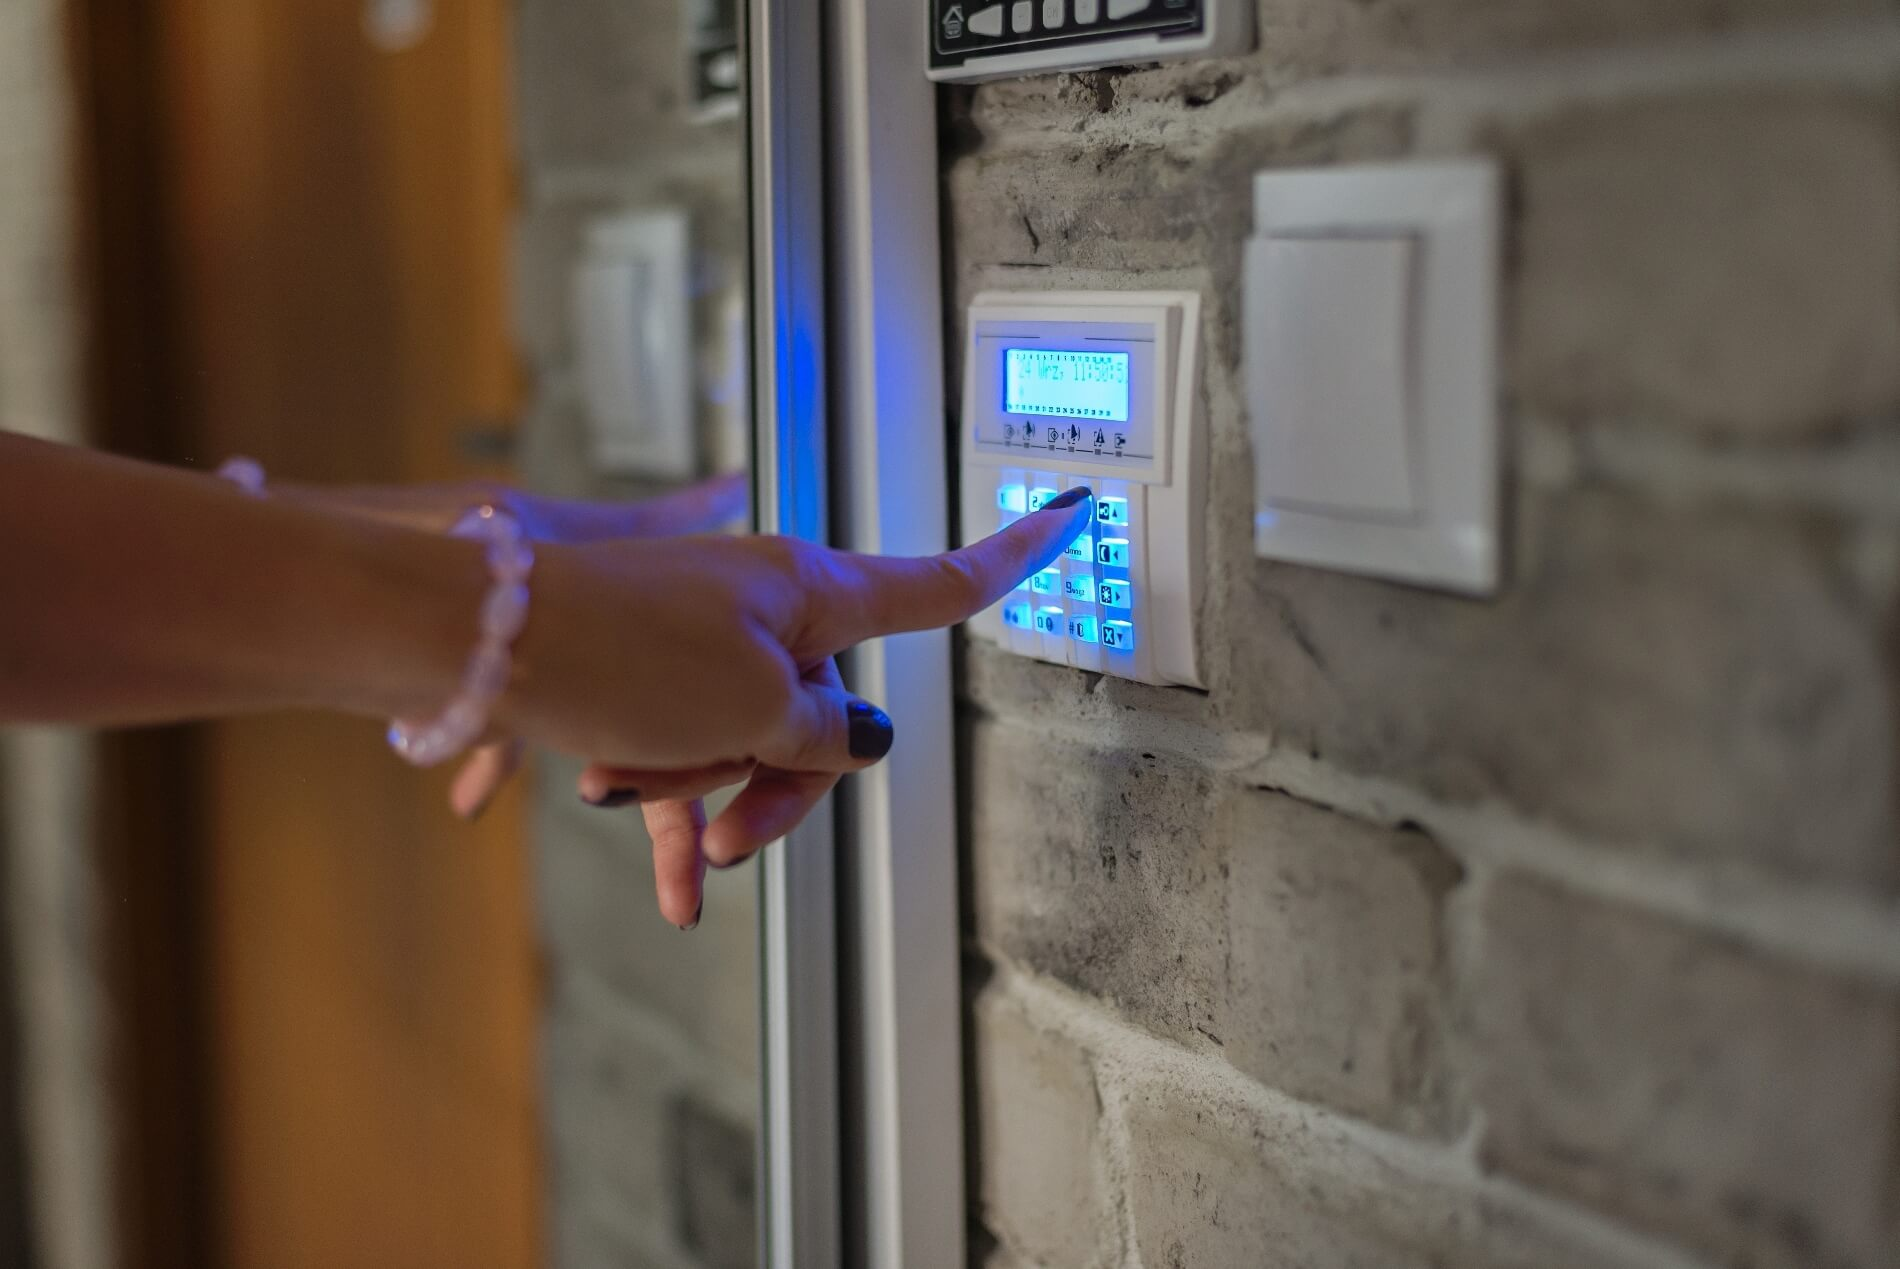 security alarm system service